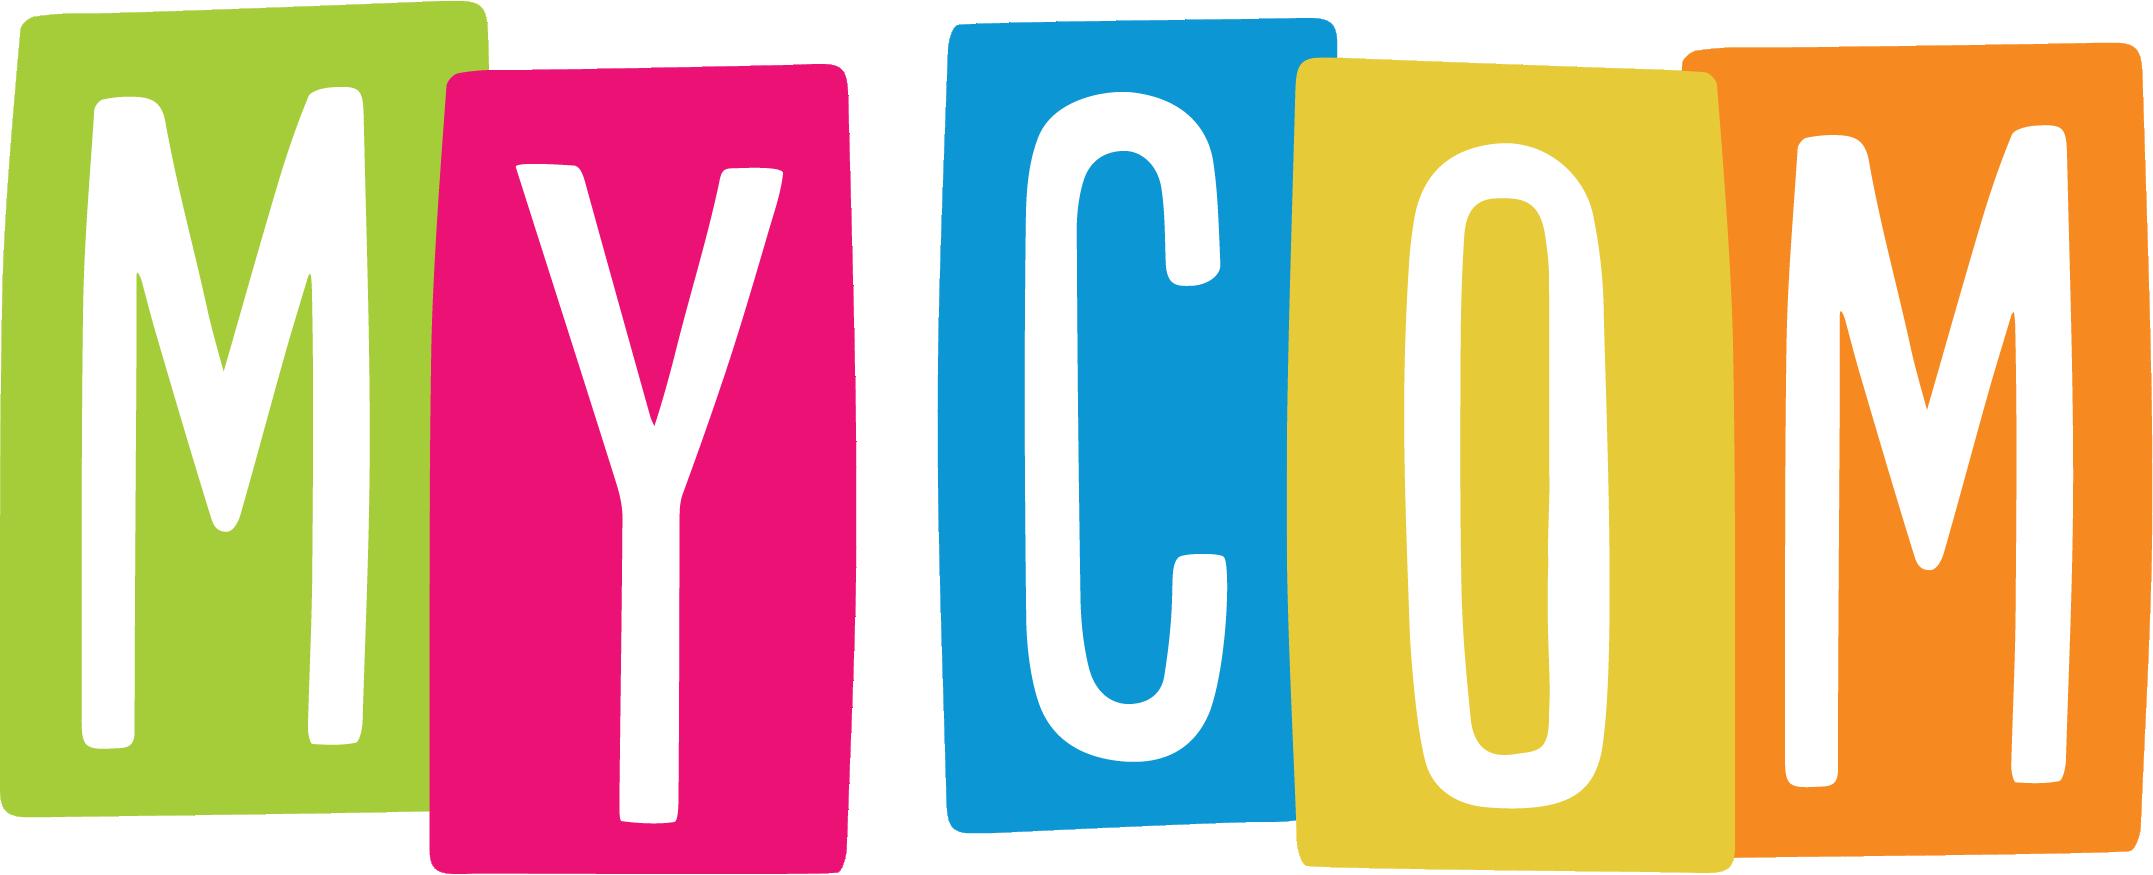 mycom logo.png